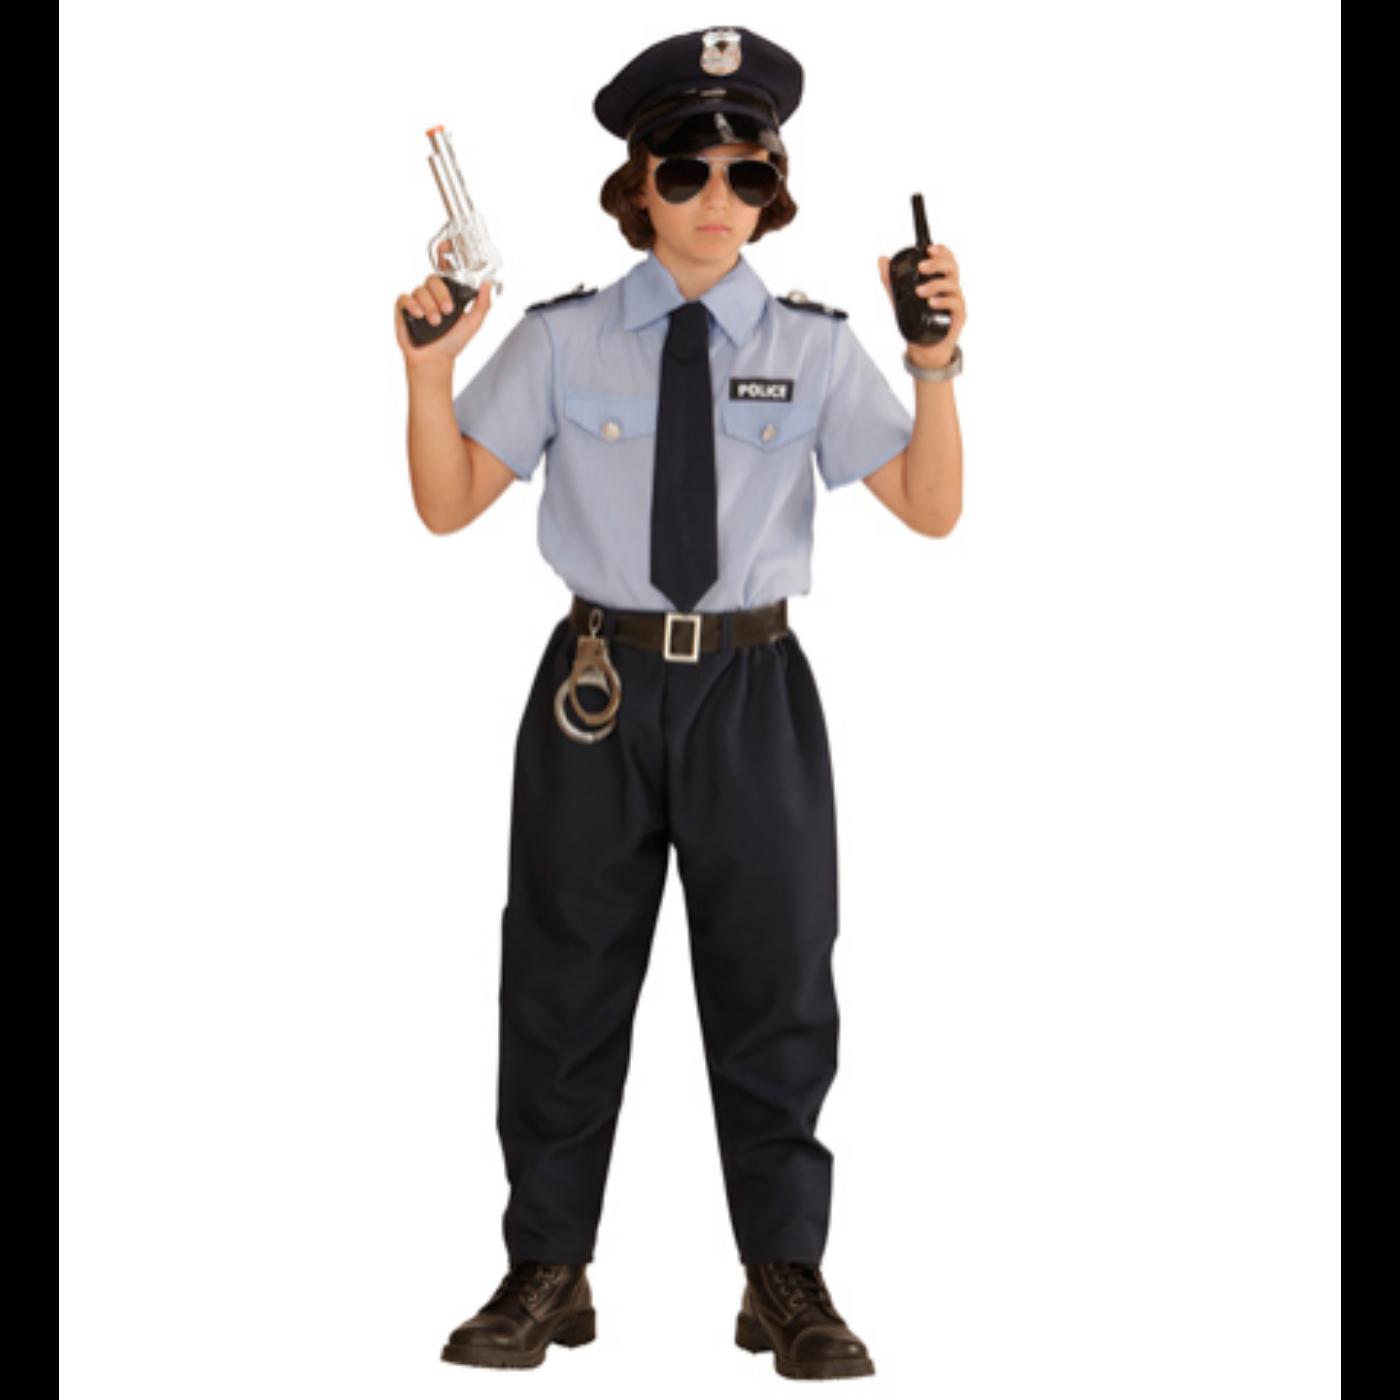 Rendőr jelmez 140-es